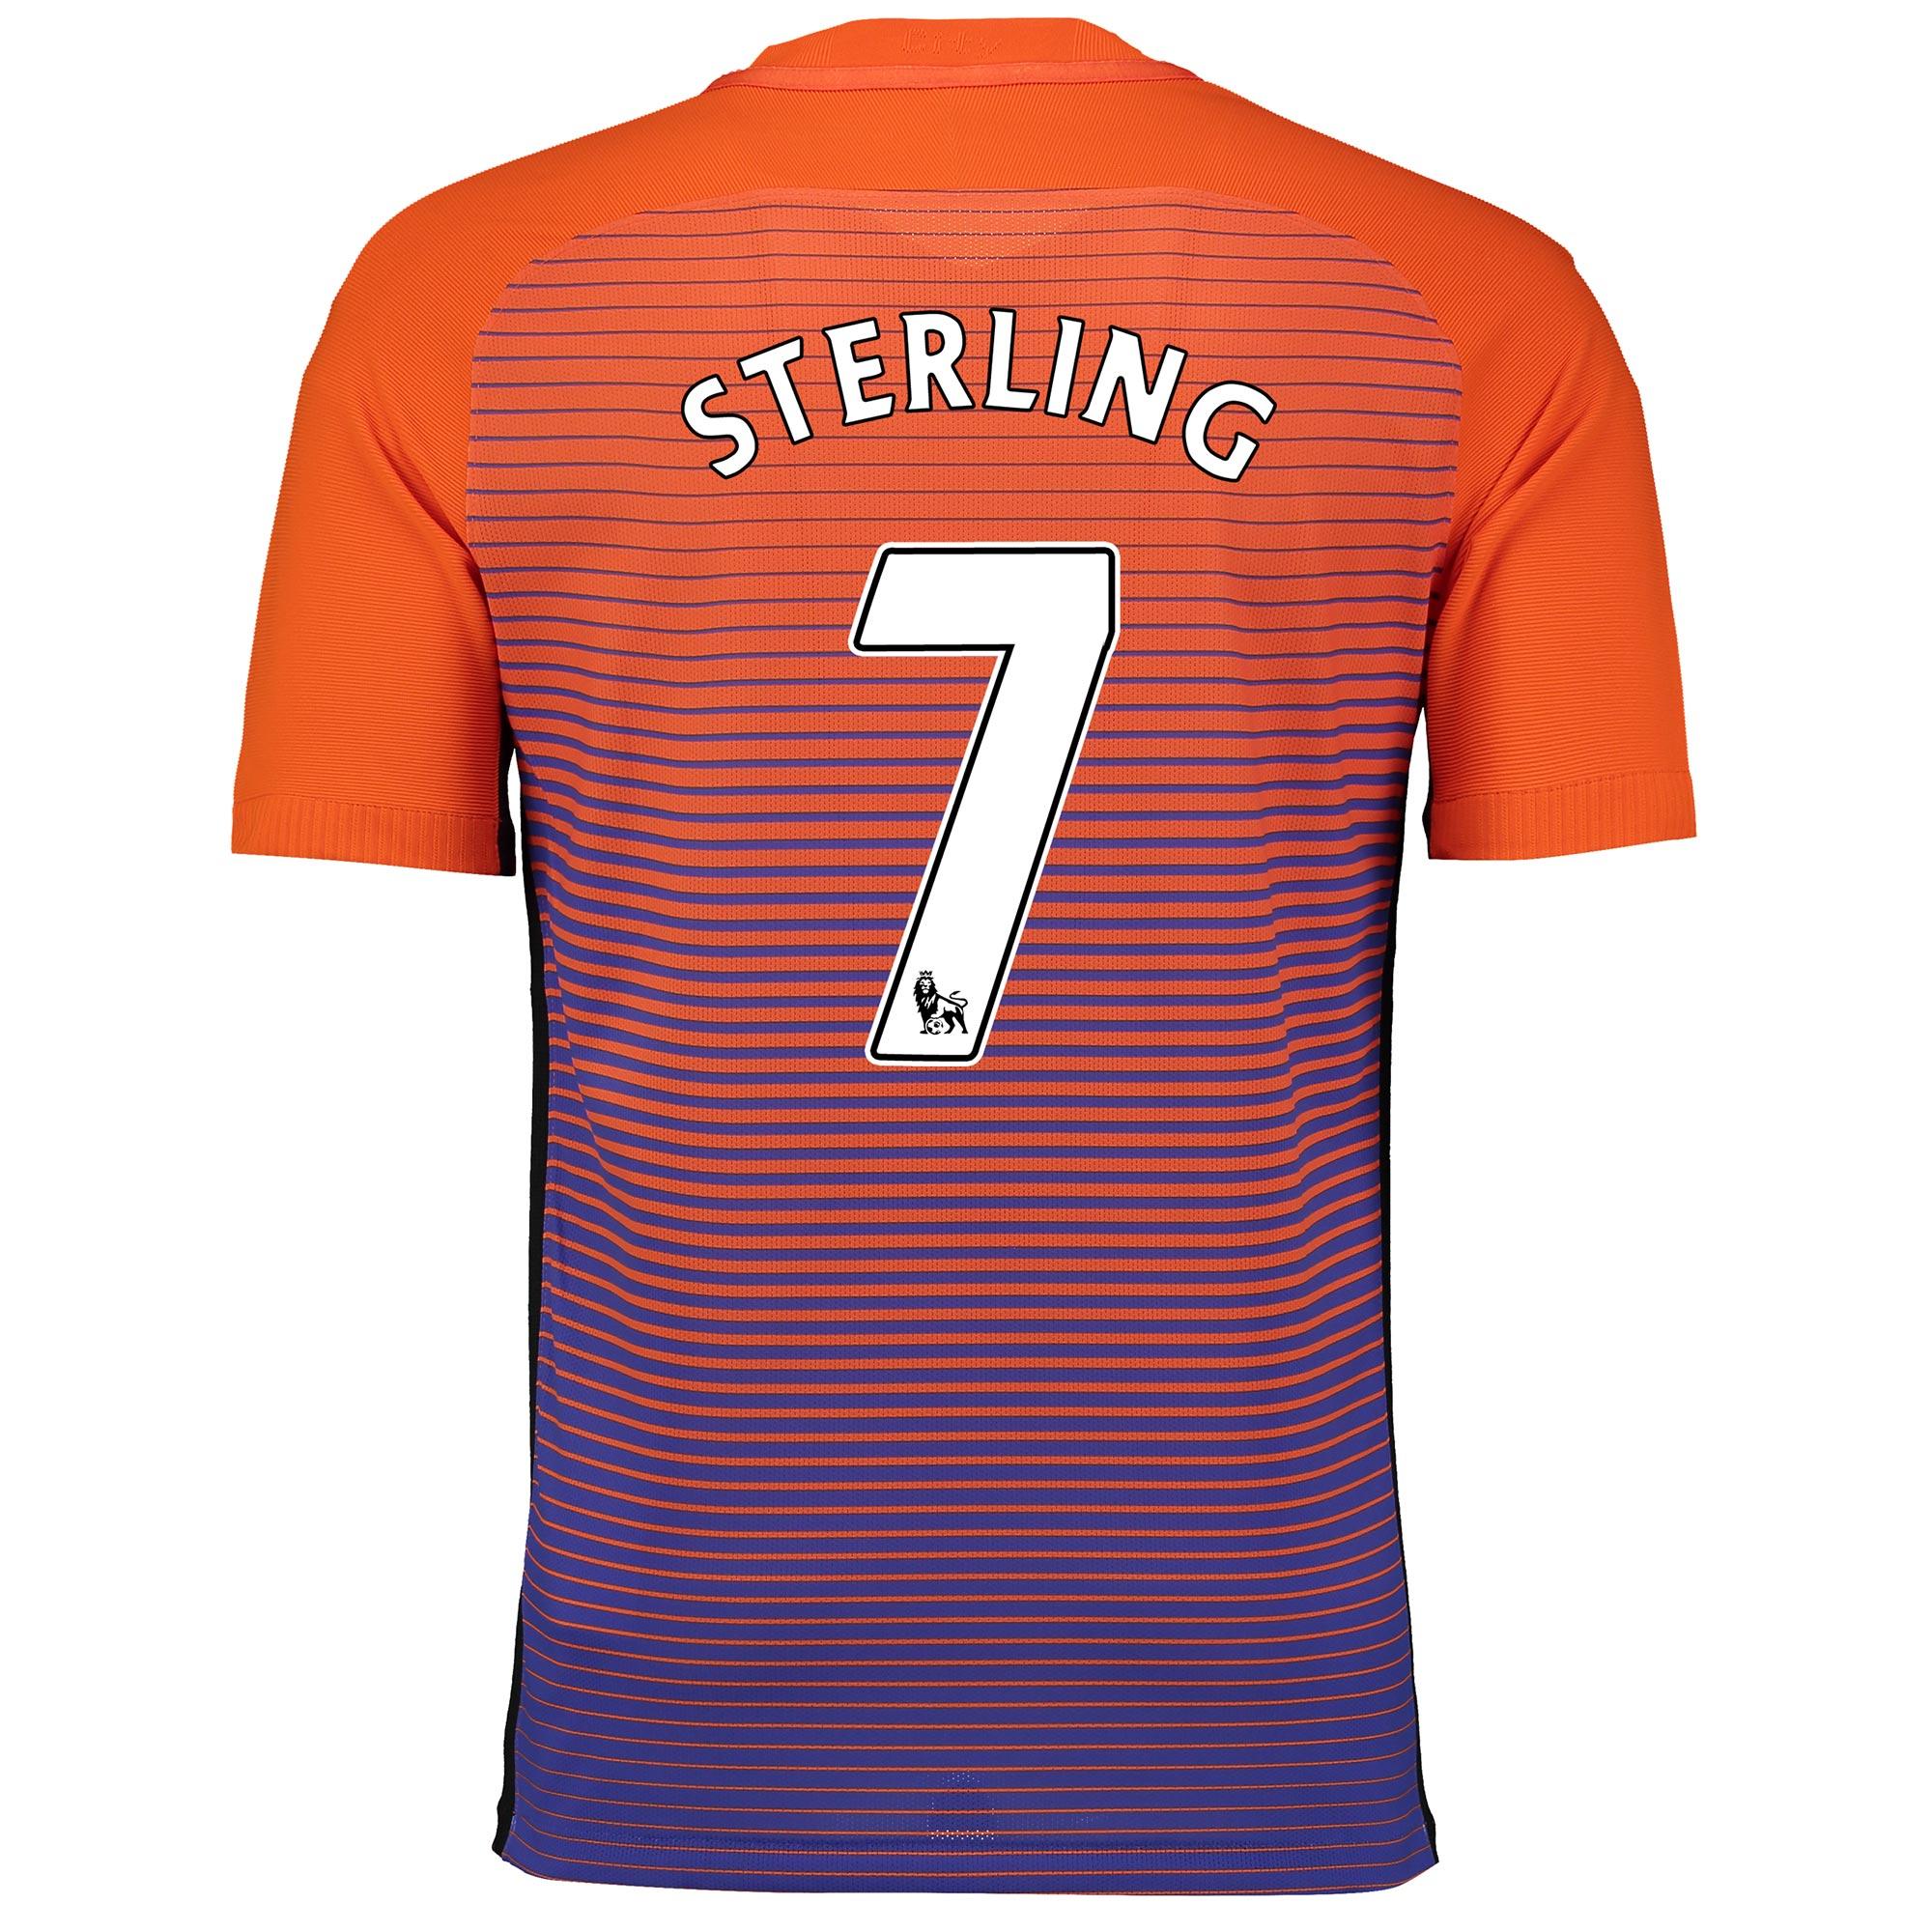 Manchester City Third Vapor Match Shirt 2016-17 with Sterling 7 printi